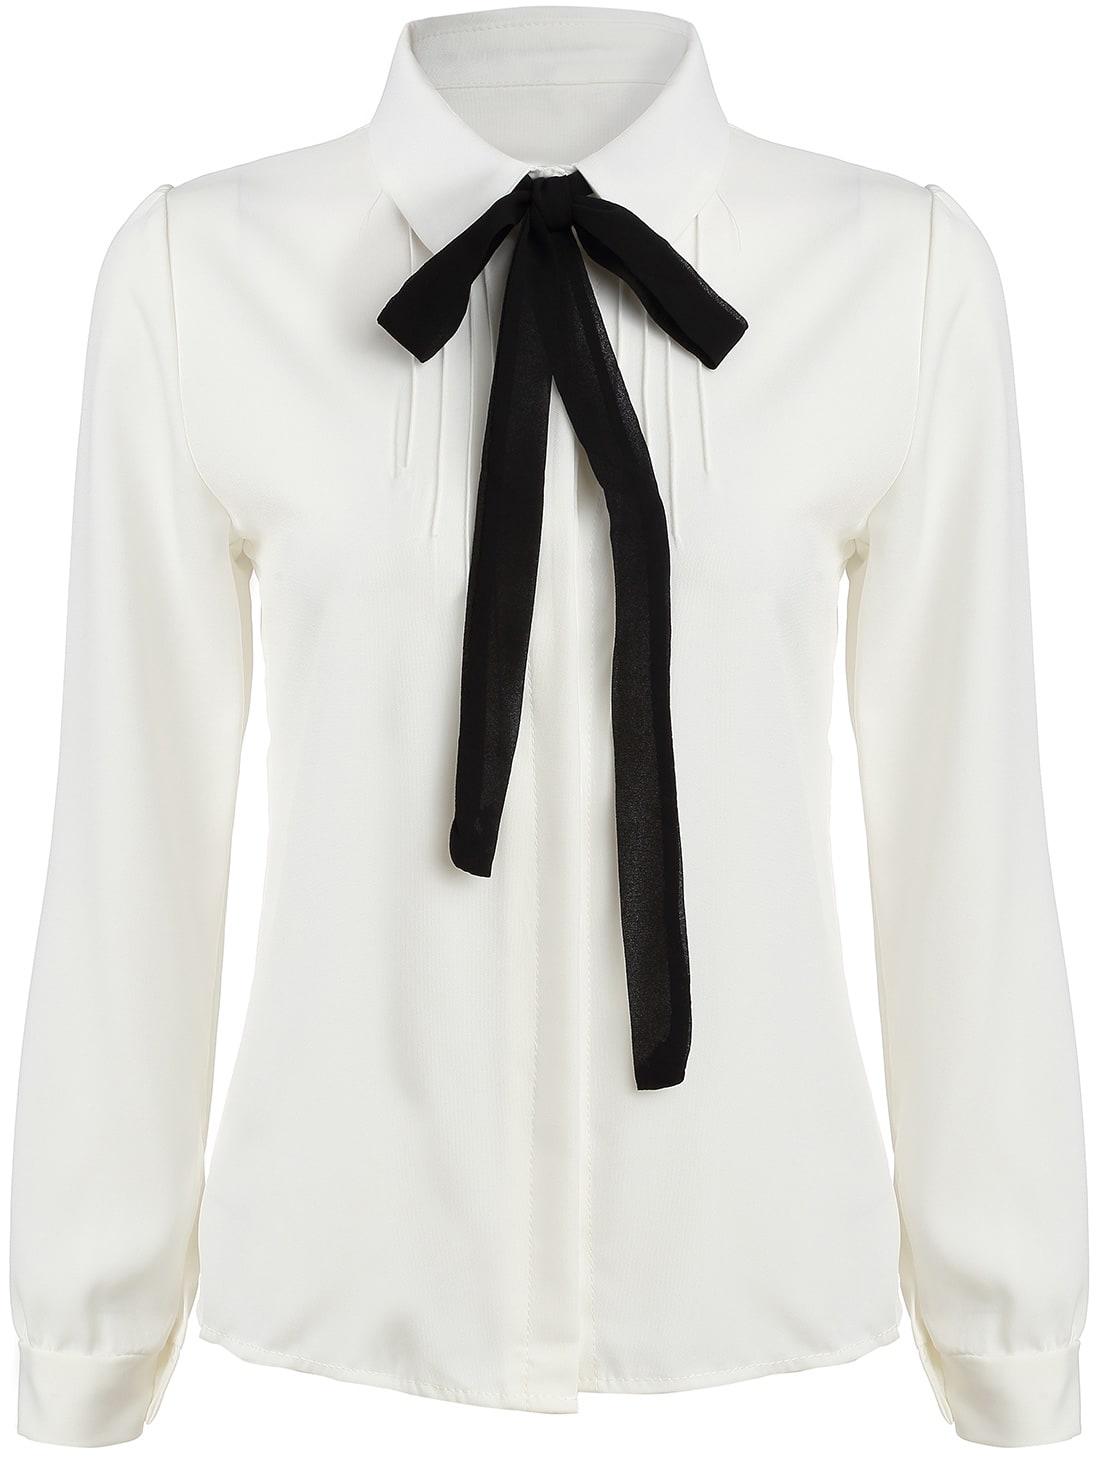 White Satin Long Sleeve Blouse 78